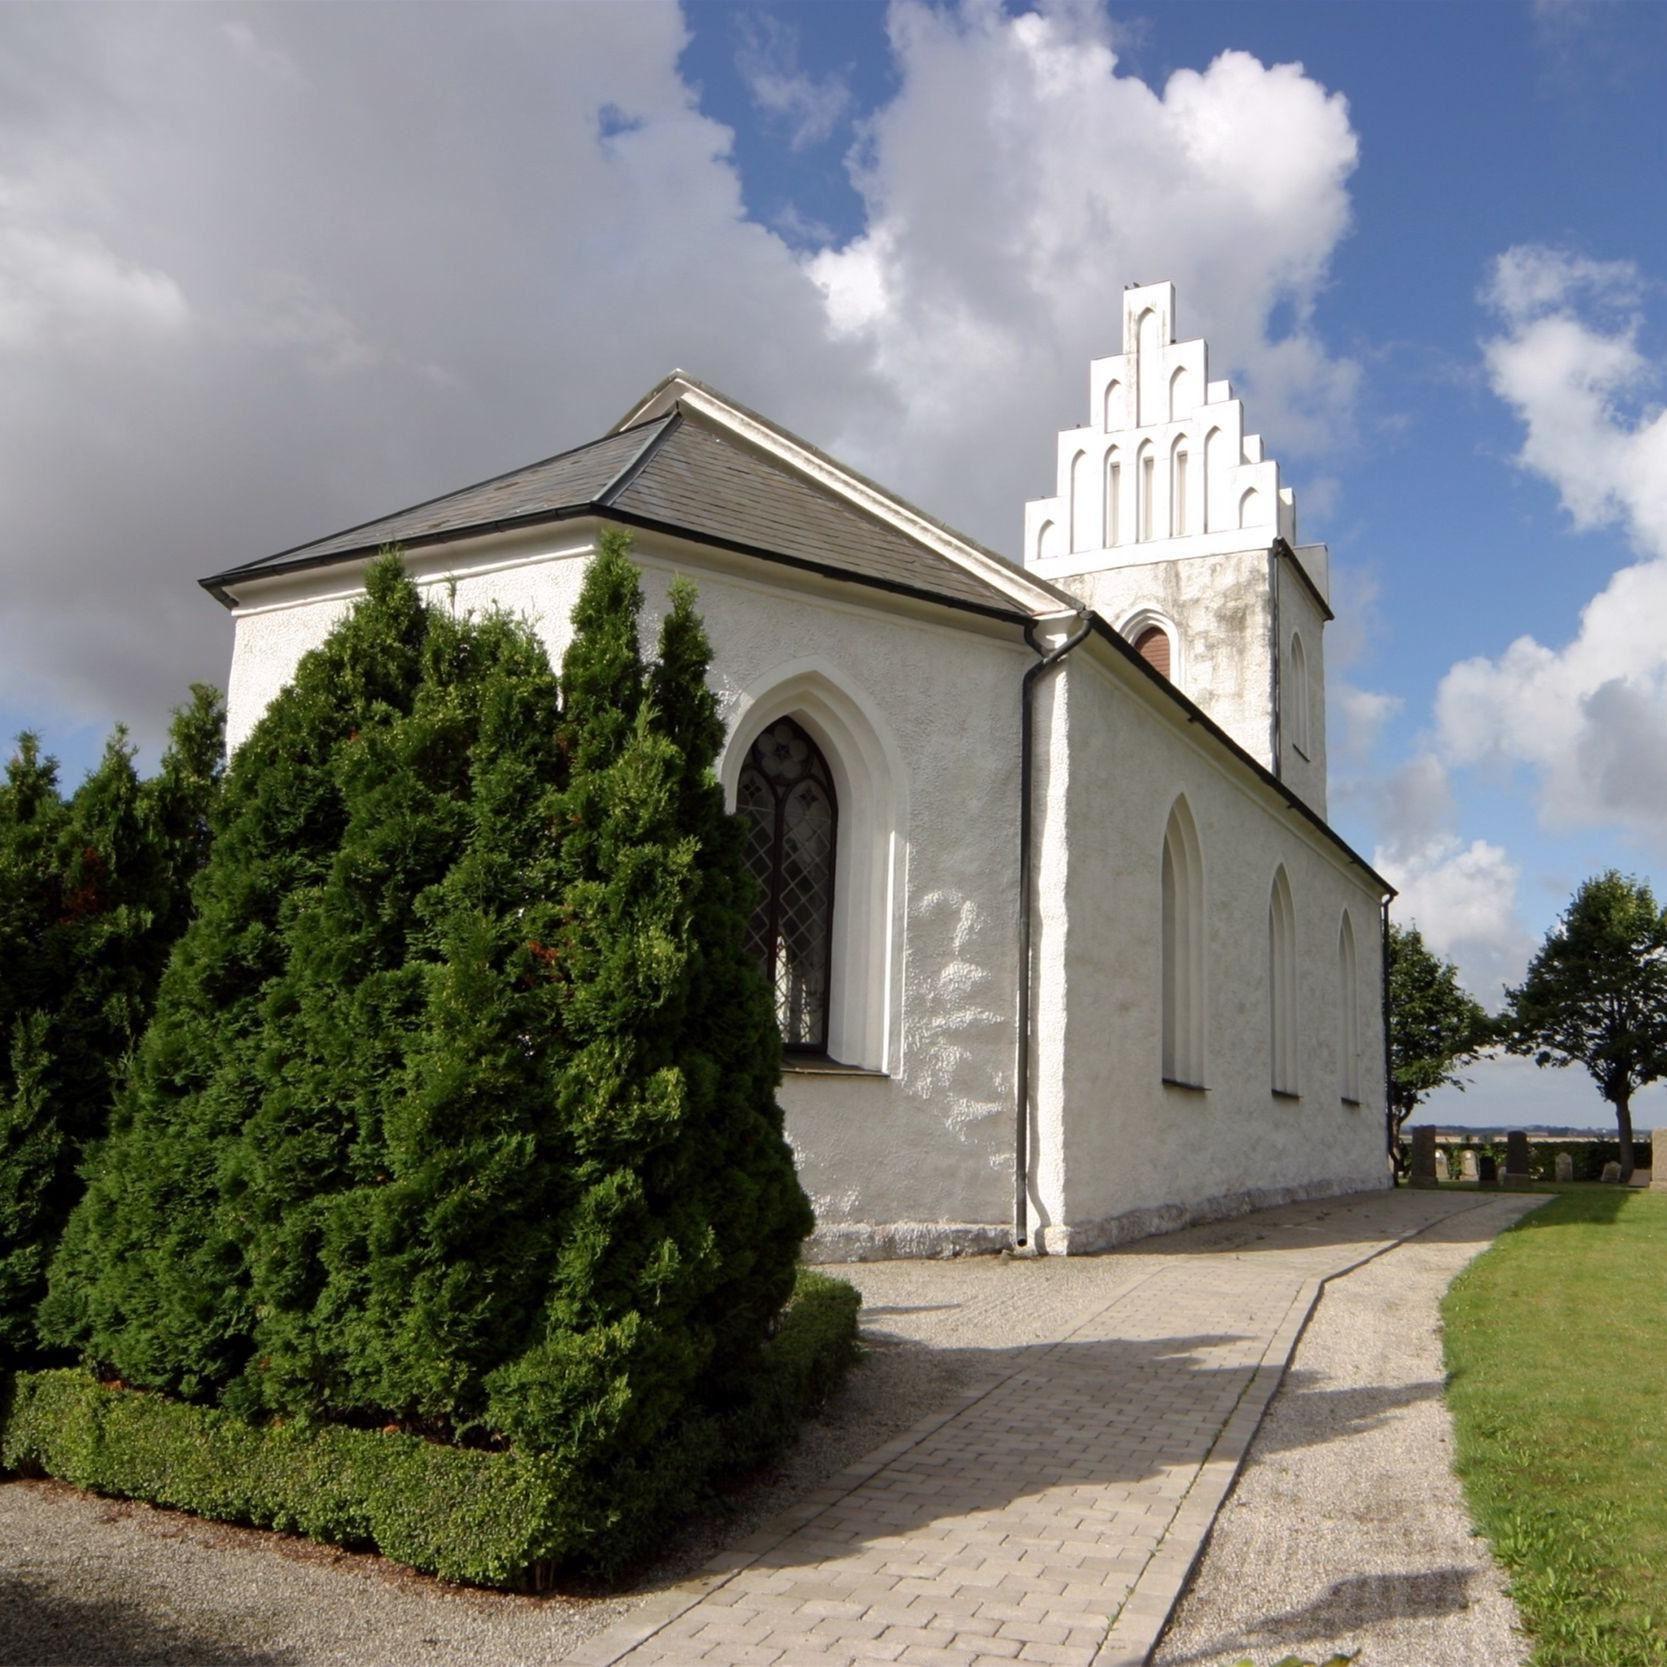 © Kävlinge kommun, Virke kyrka